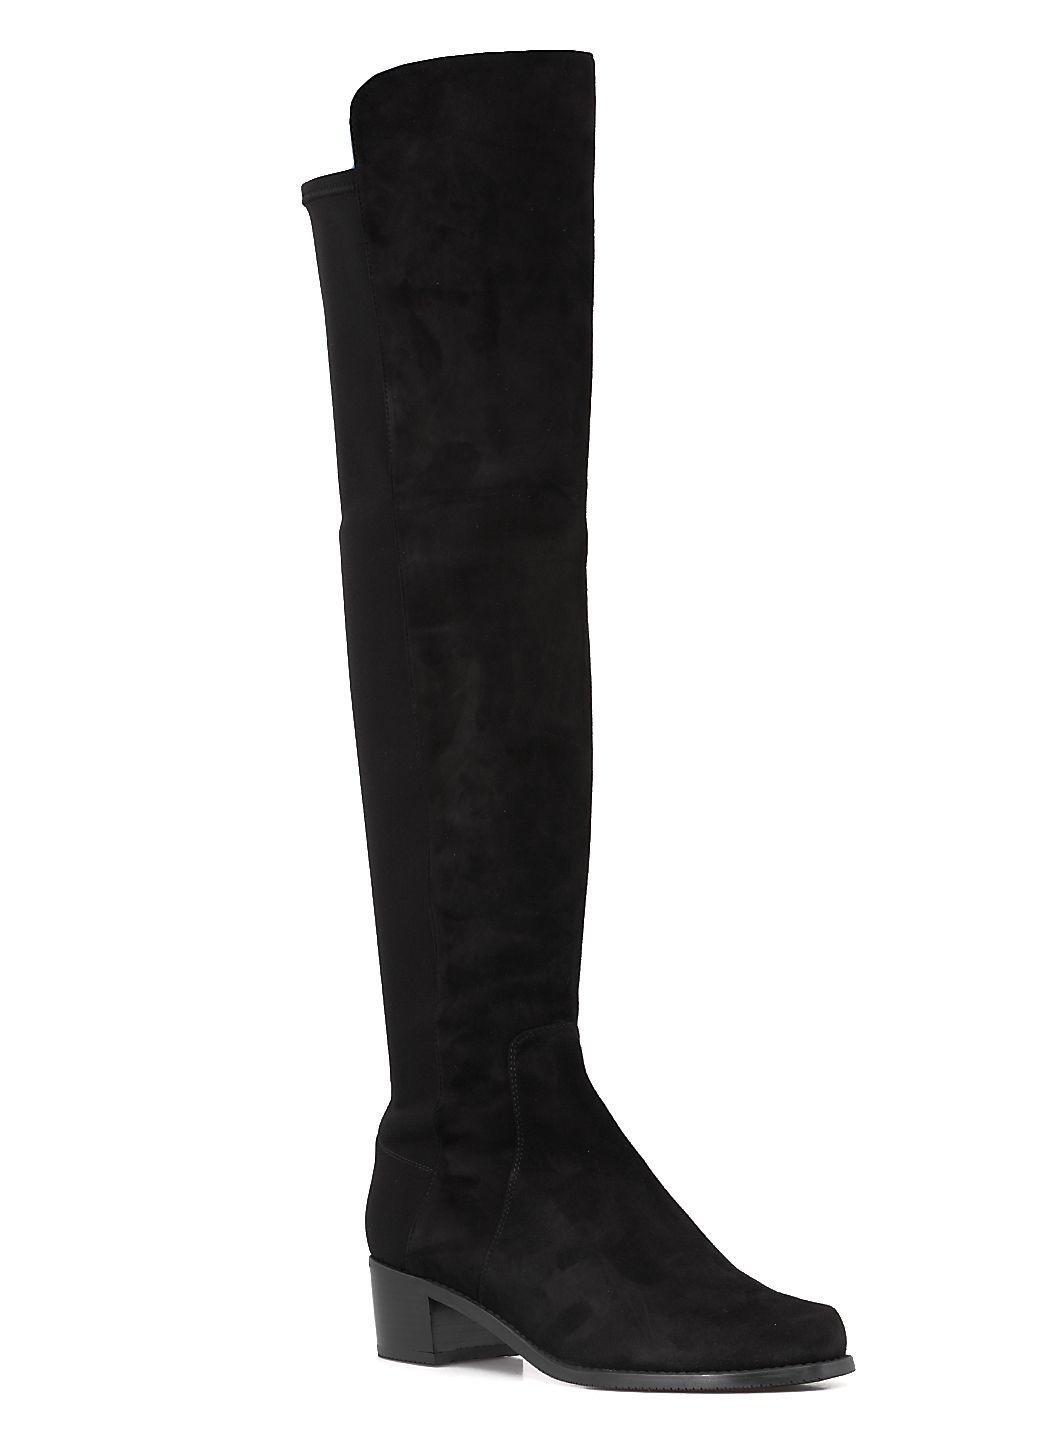 Reserve boots